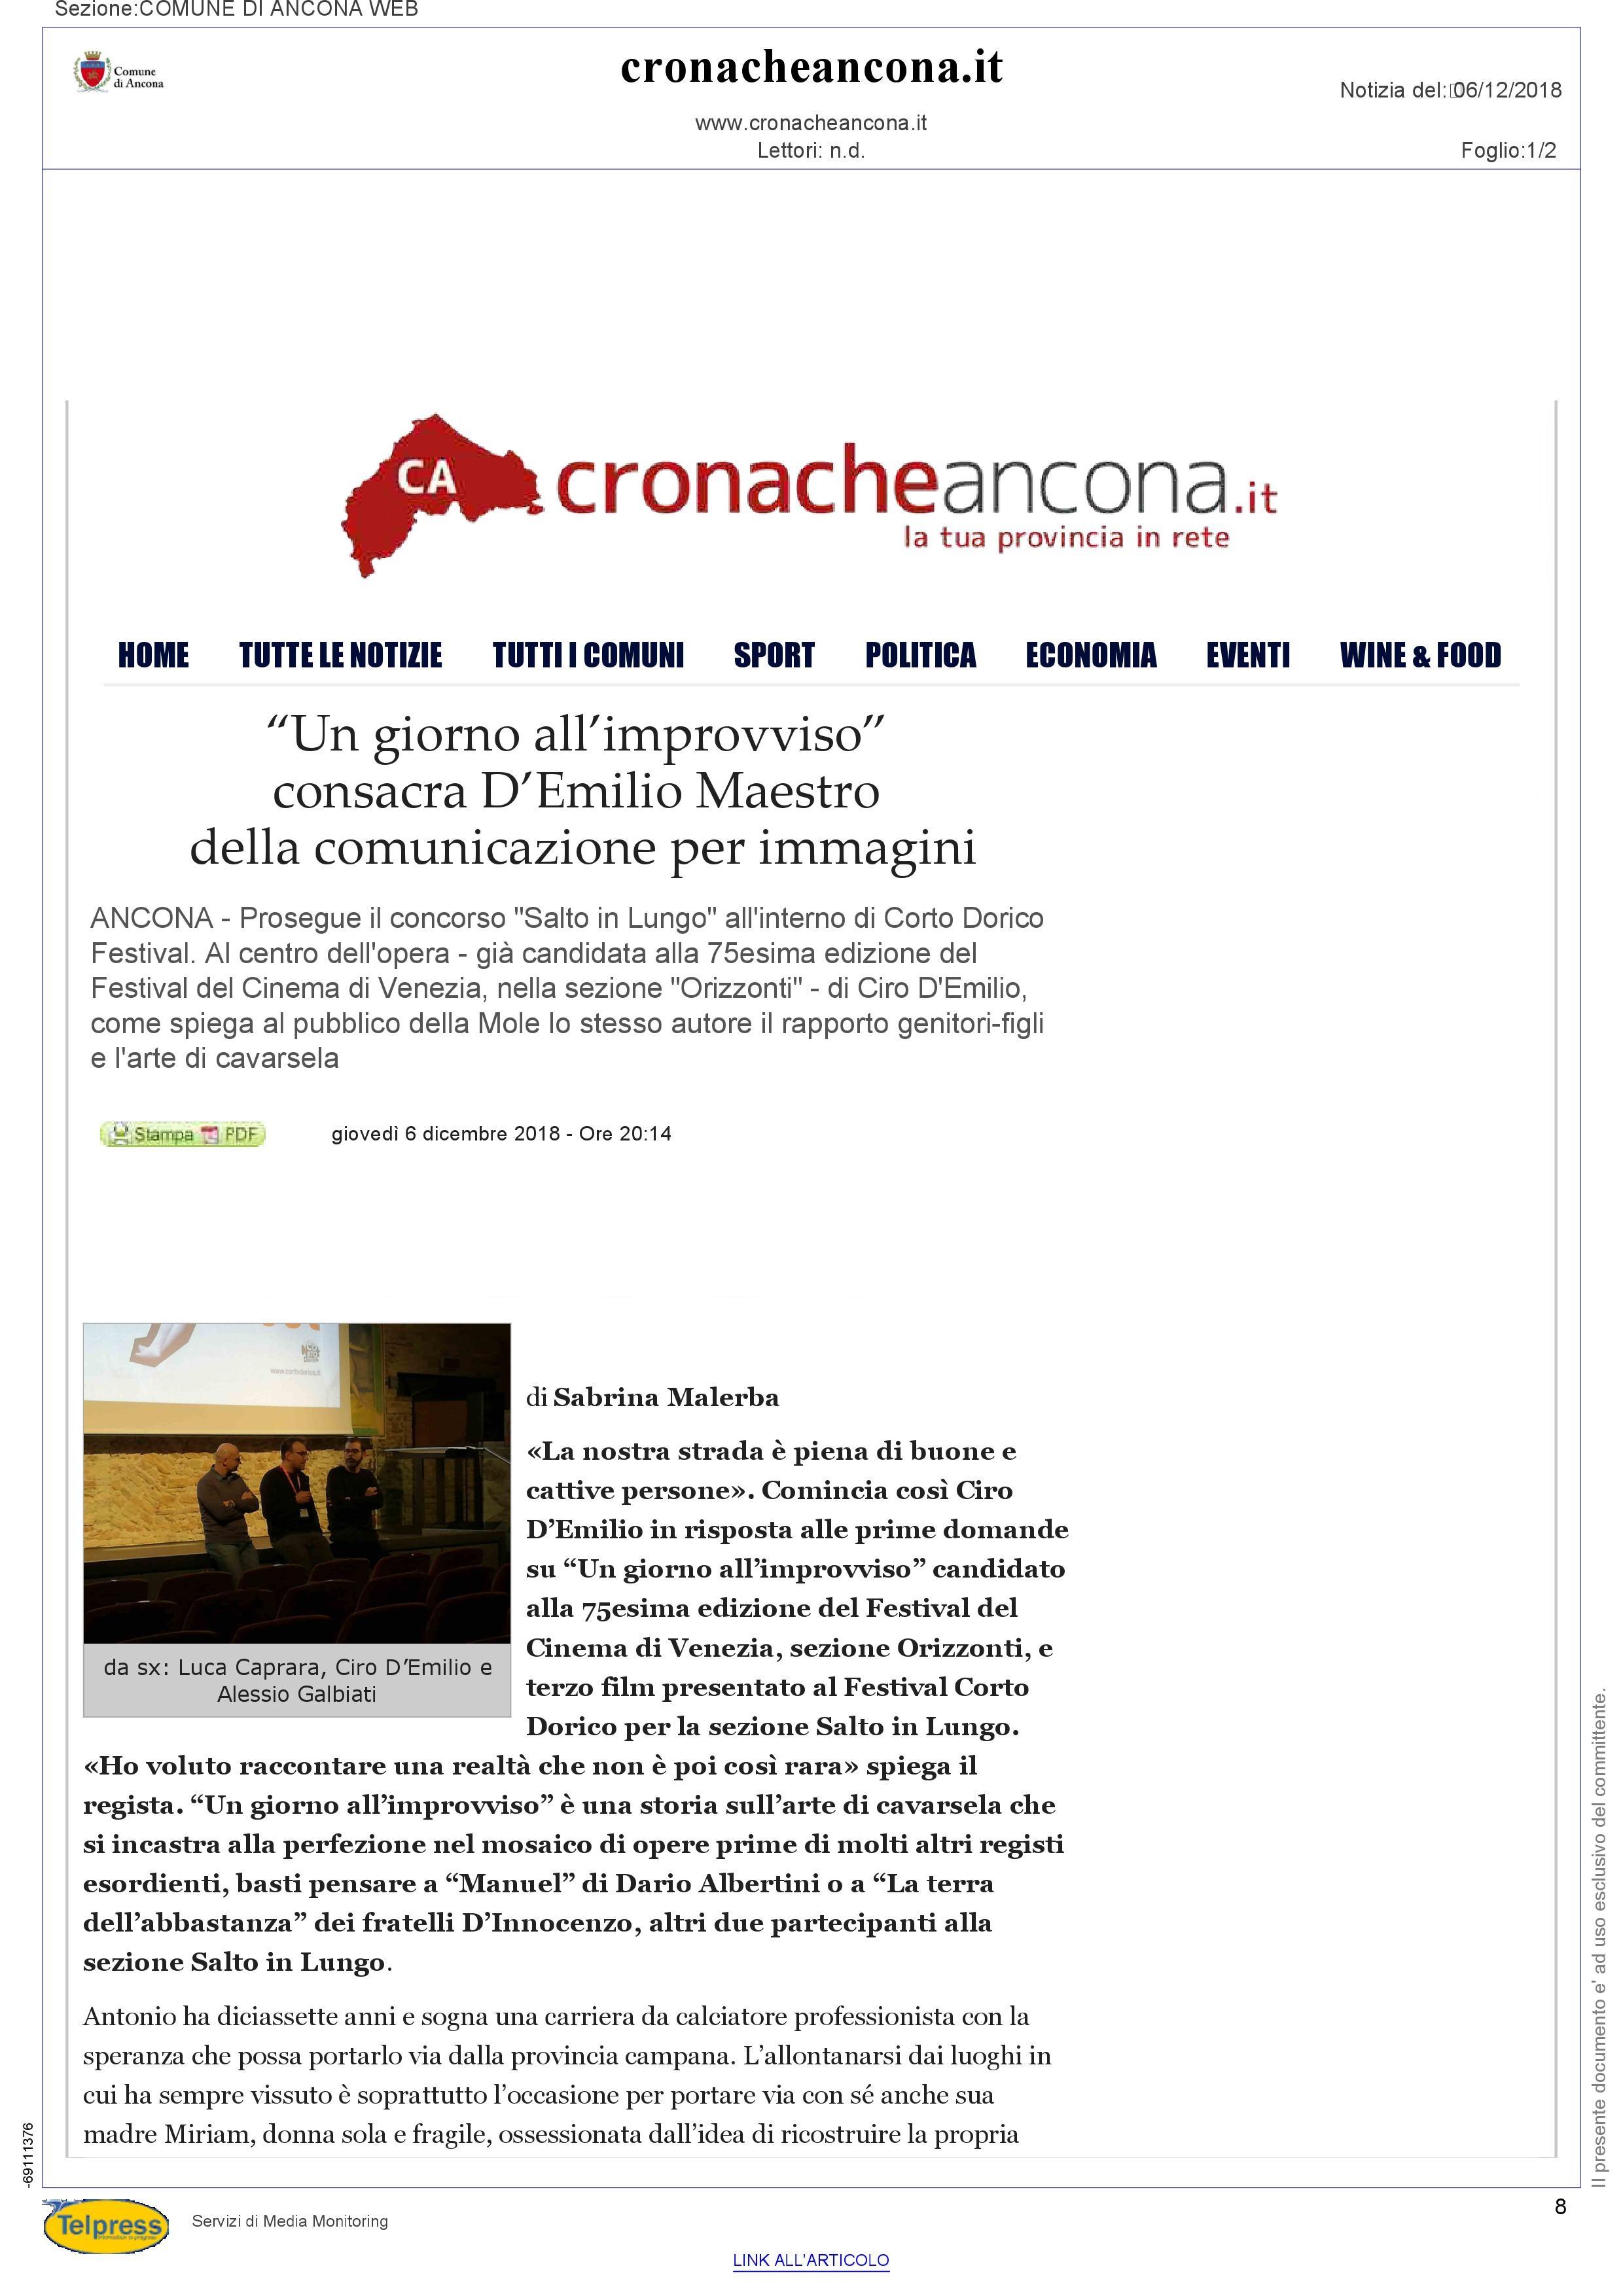 6-12-18 Cronache Ancona pag 1